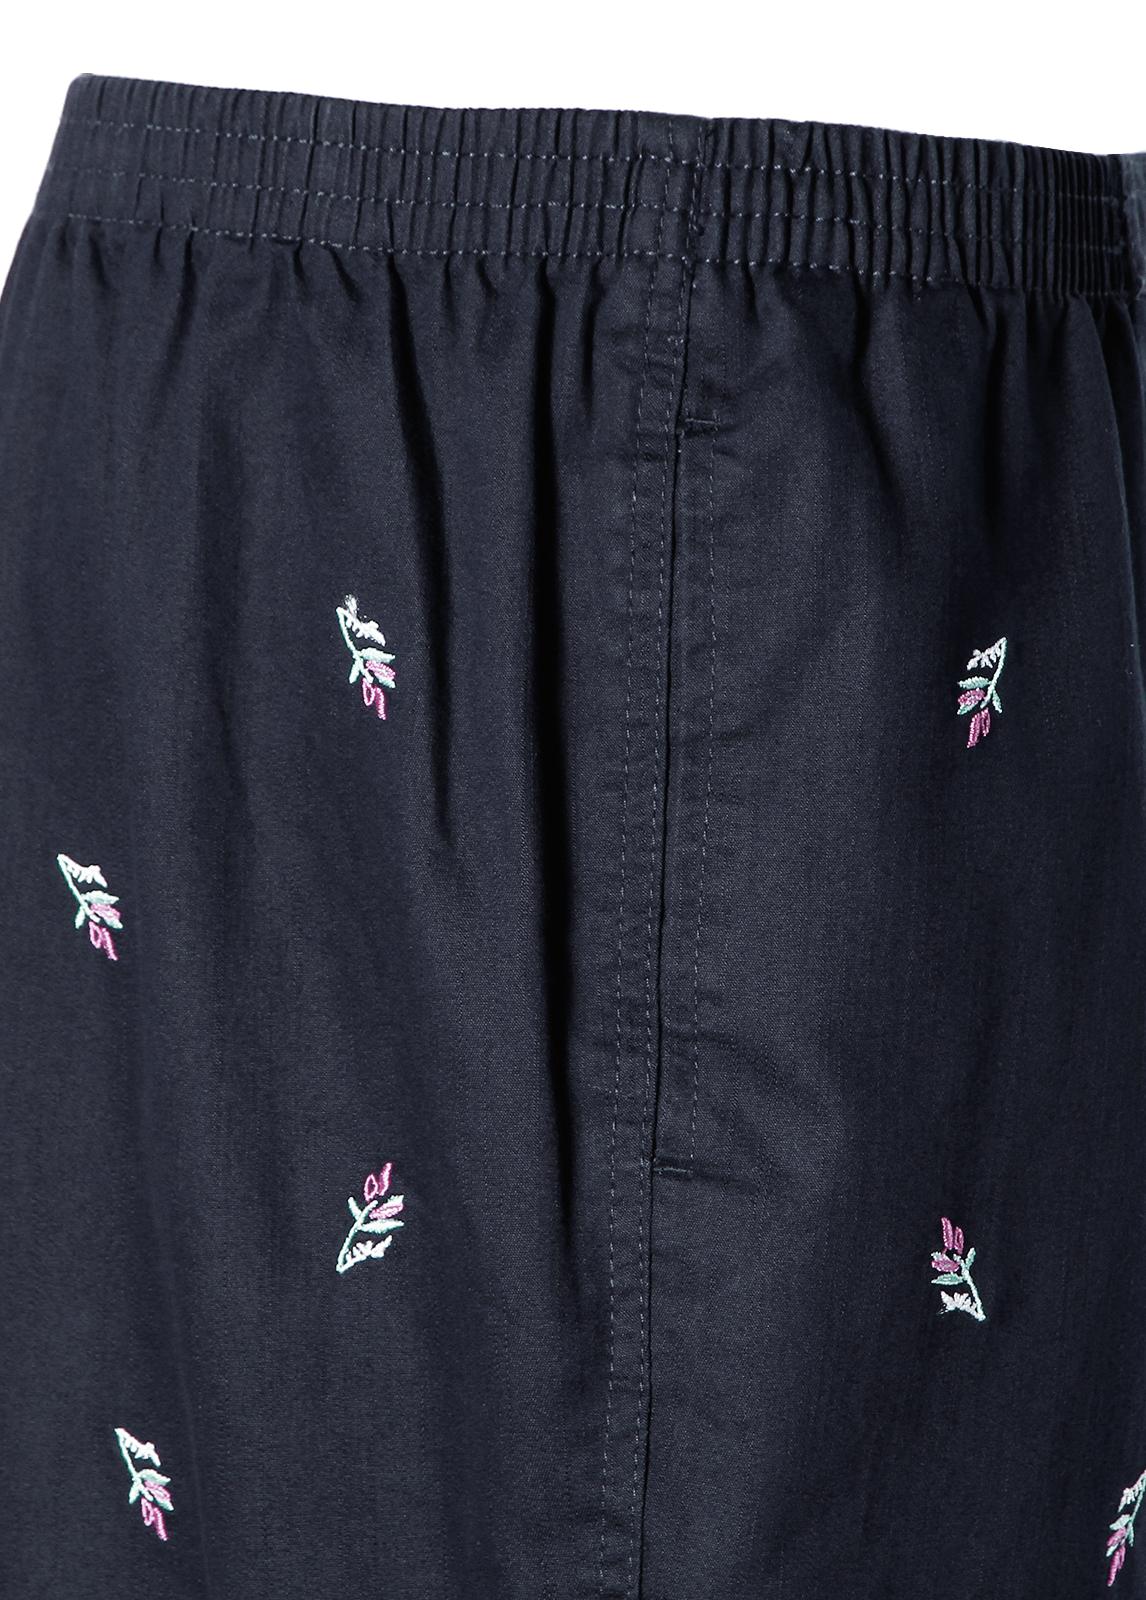 Lastest Womens High Elastic Waist Denim Casual Jeans Ladies Pull On Pants Size